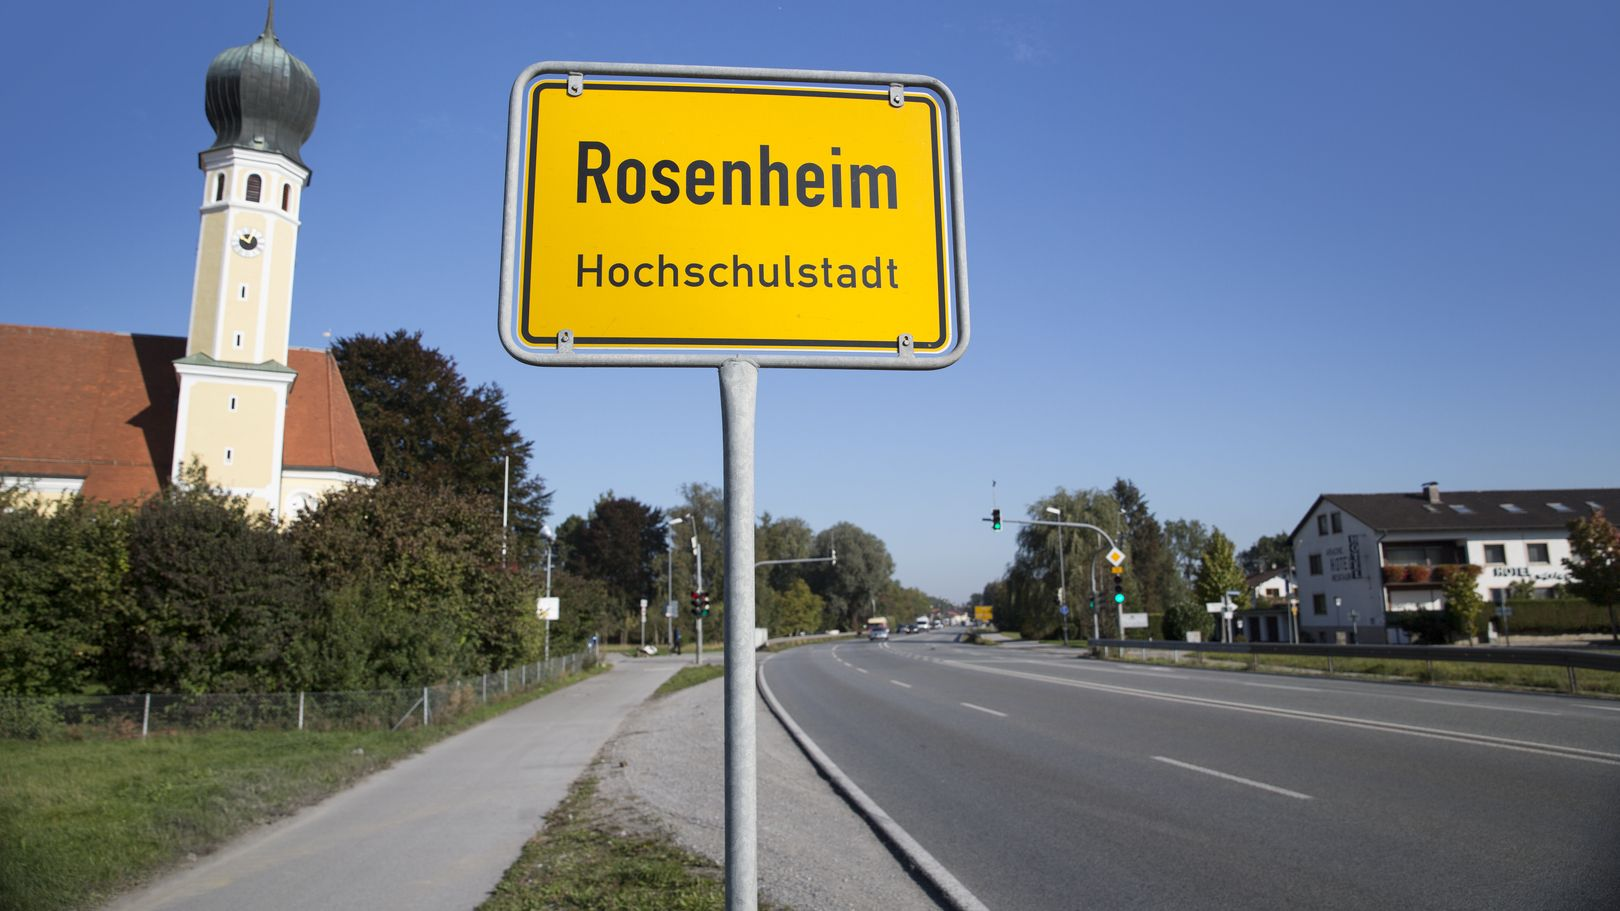 Ortseinfahrt Rosenheim mit Ortsschild, links: Kirche, rechts: Wohnhäuser